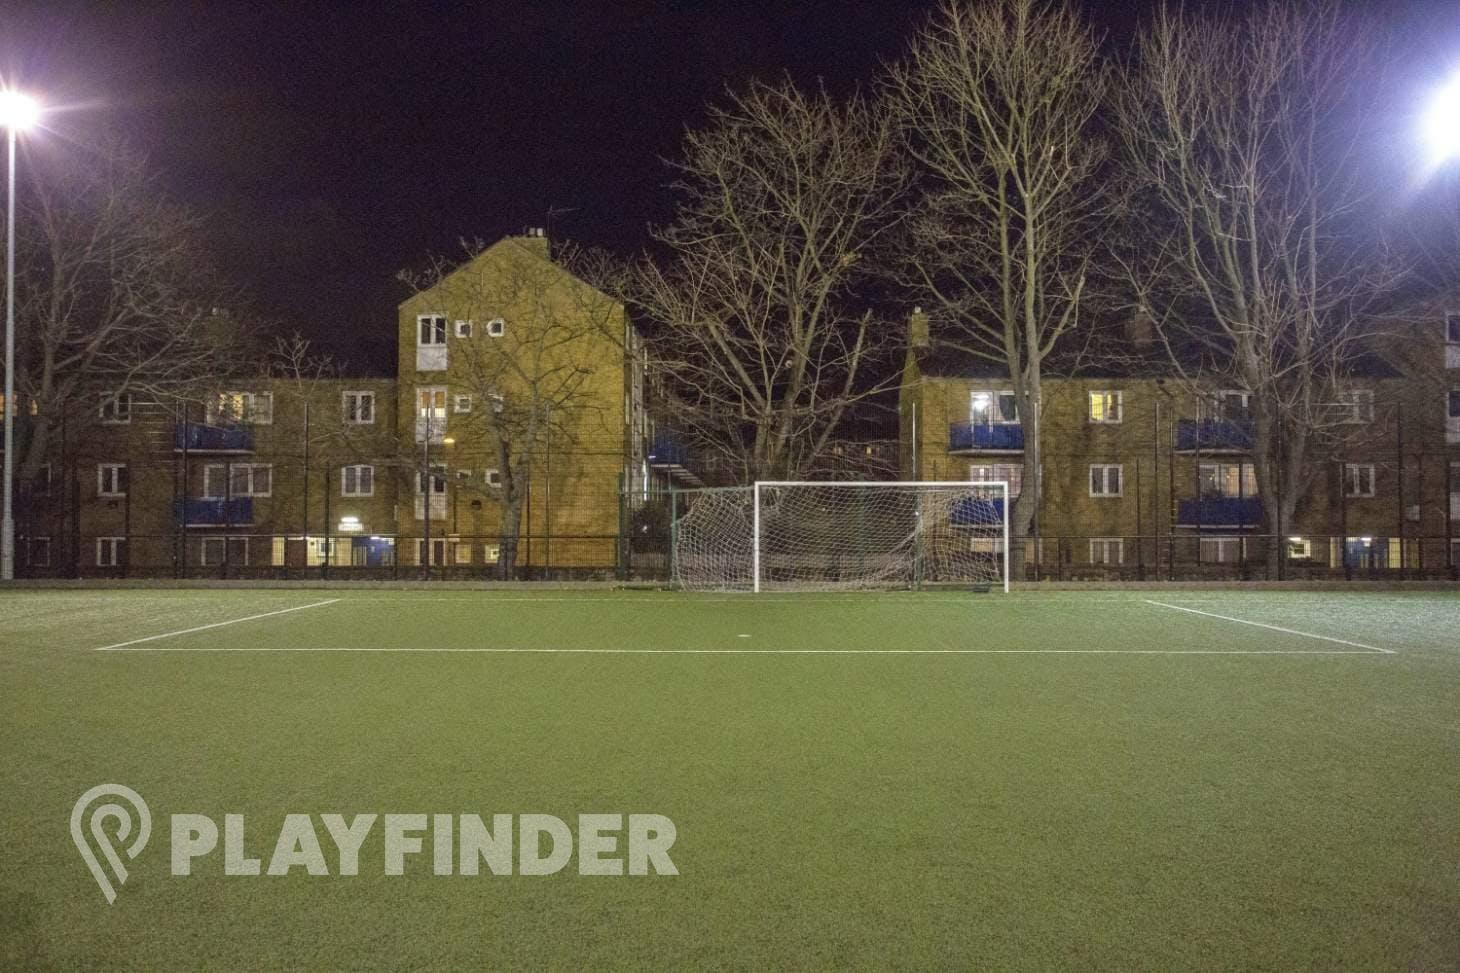 Globe Academy 7 a side | 3G Astroturf football pitch